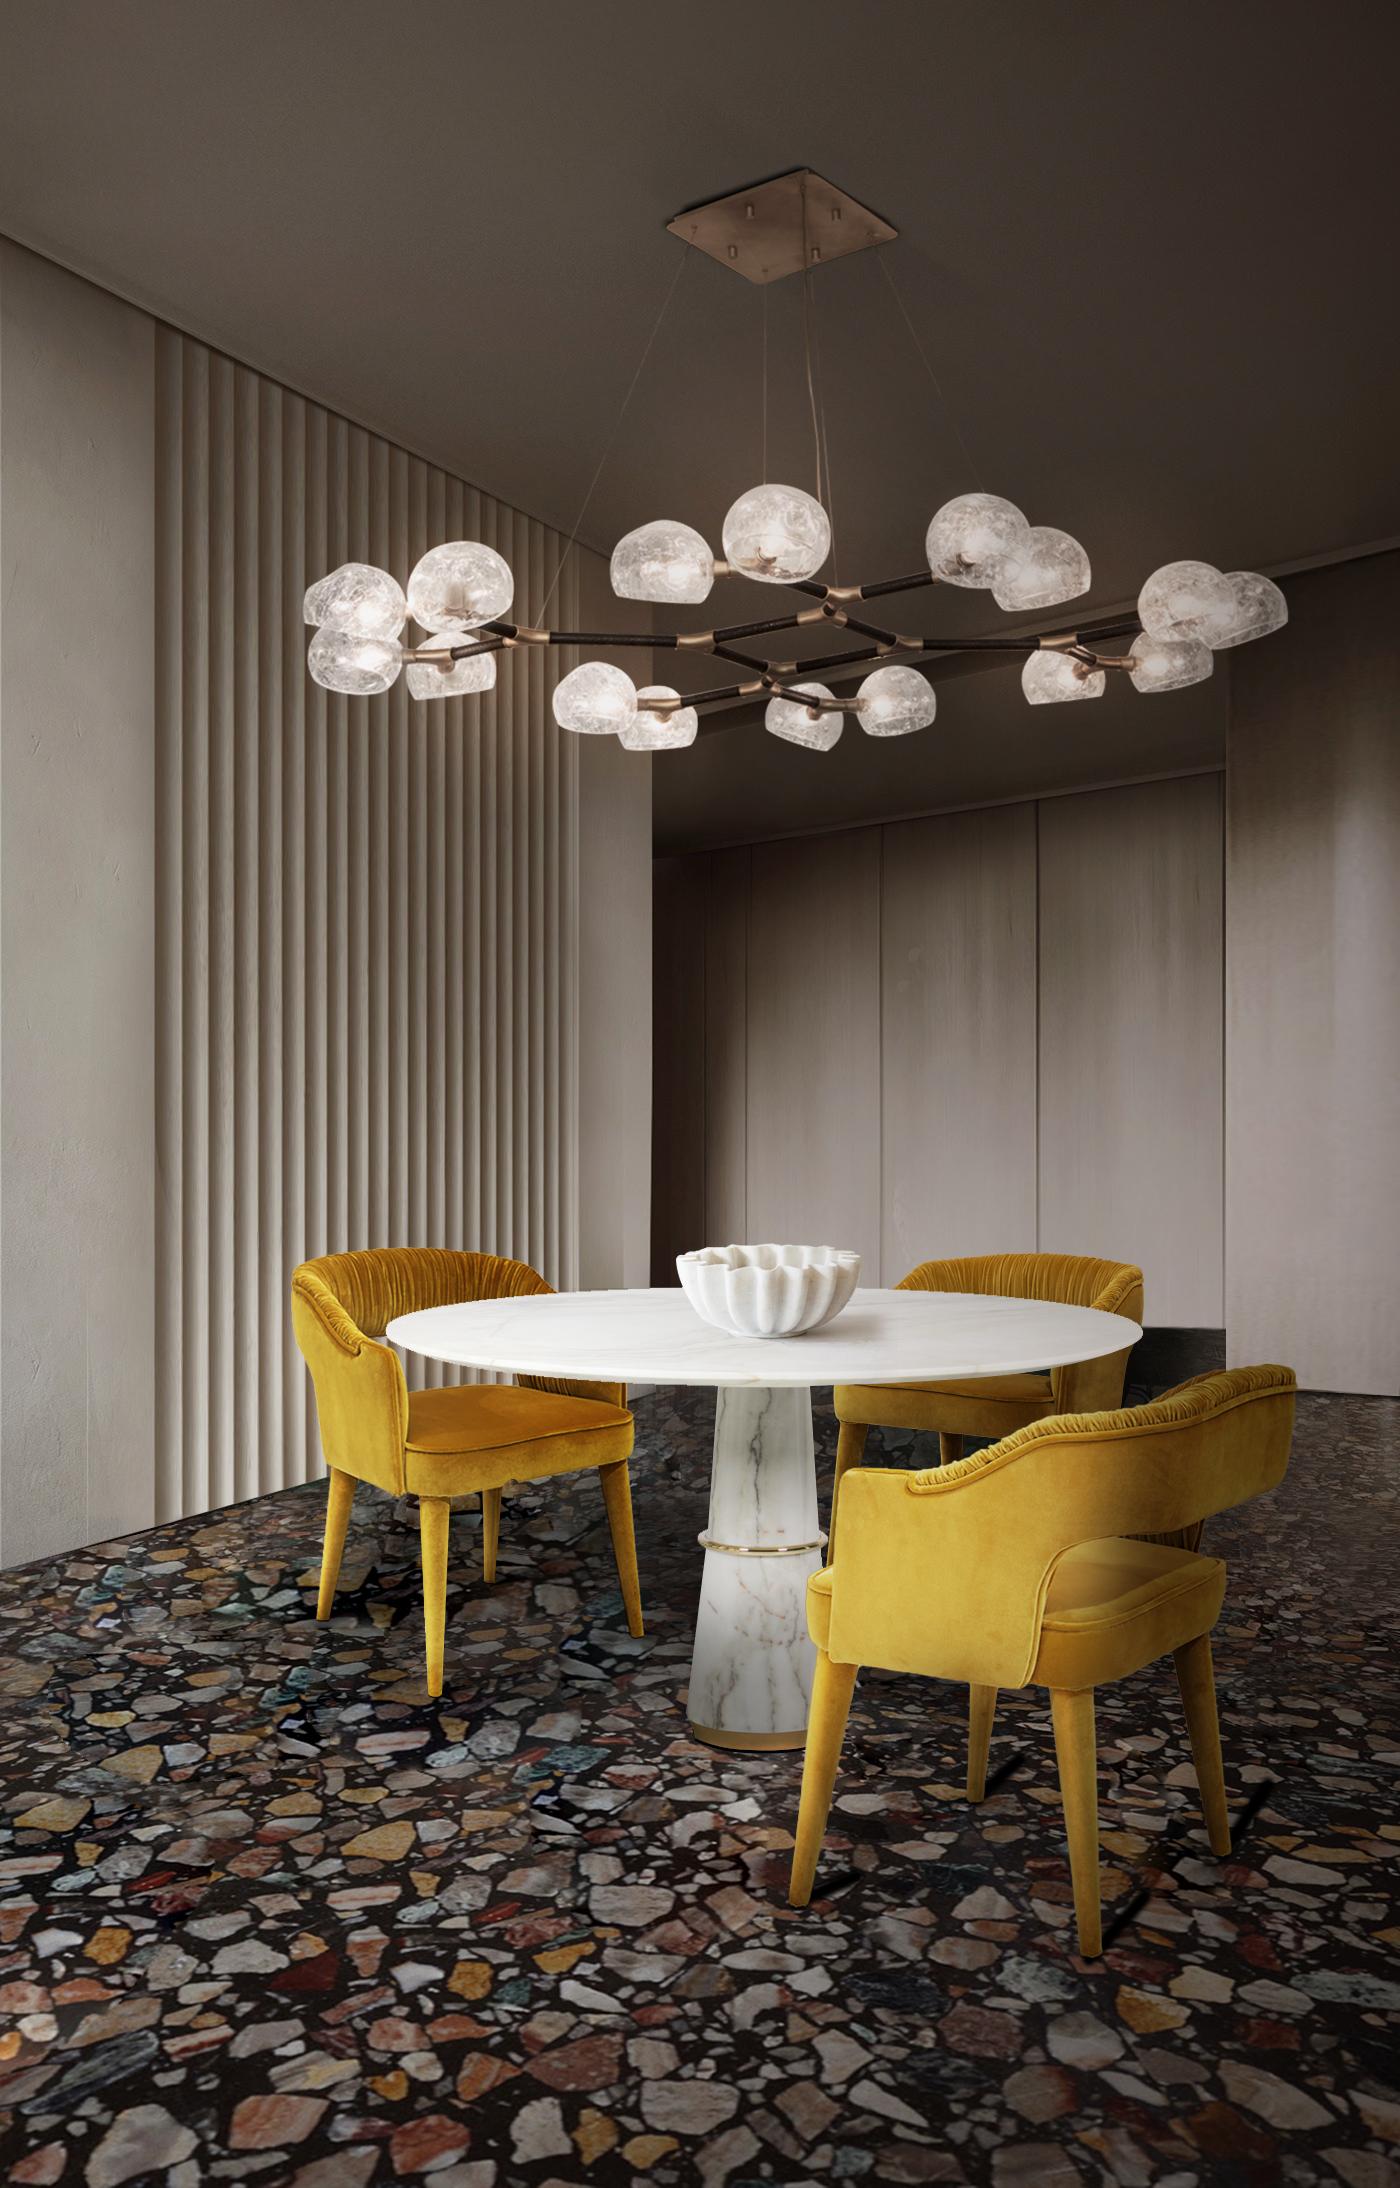 STOLA Dining Chair; Dining Chair; Upholstery; Modern; Sophistication; Elegance; Classiness; Comfort; Fierceness; BRABBU; Design; Furniture stola dining chairSTOLA Dining Chair: A Symbol of Elegance and Sophisticationlifestyle stola